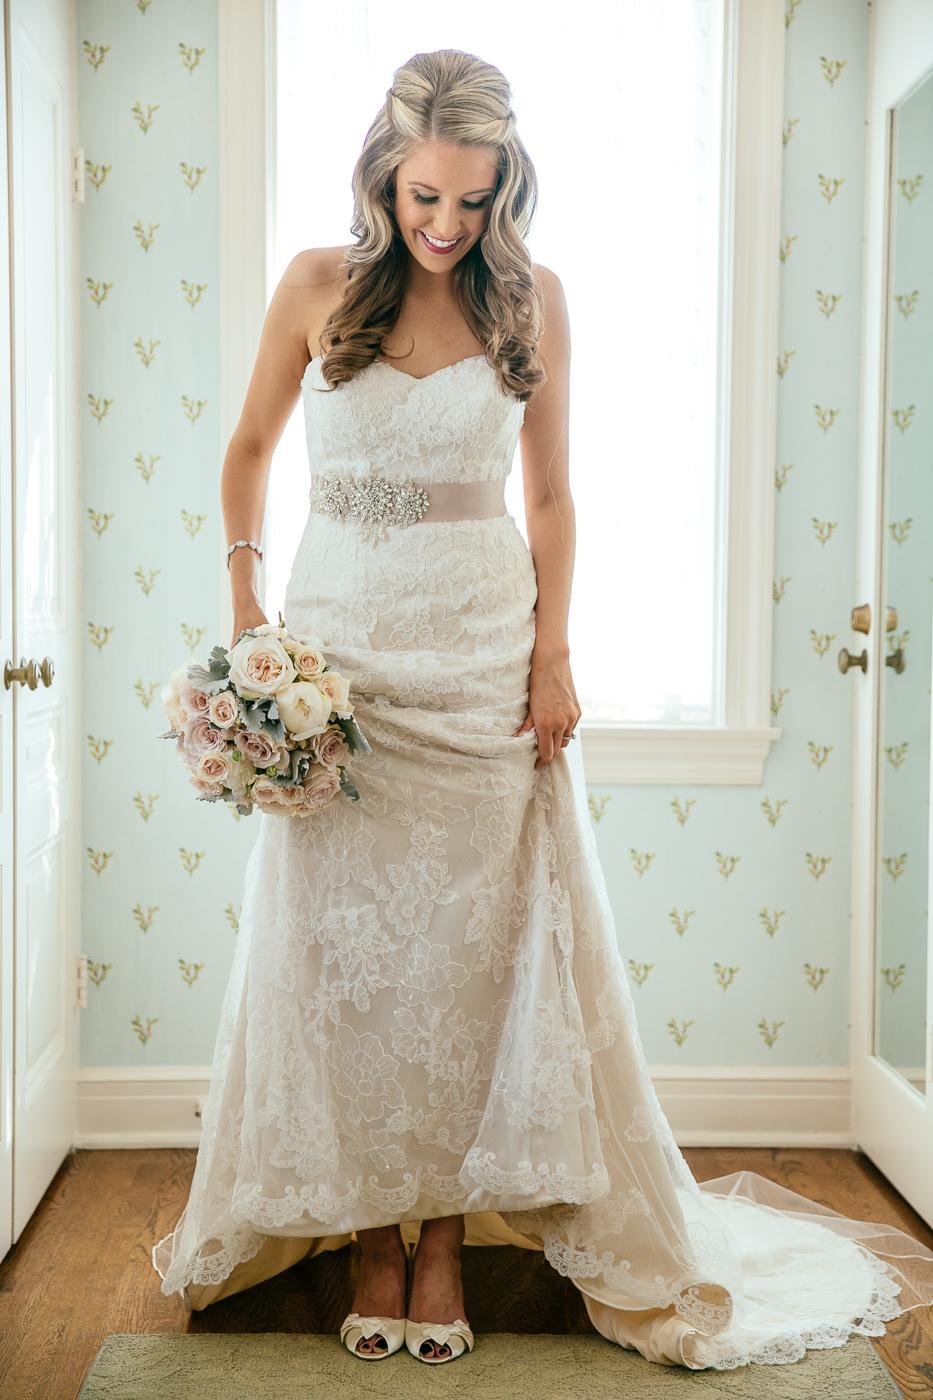 RYAN_&_KELLEY_DARLINGTON_HOUSE_WEDDING_2014_7X9A1727.JPG